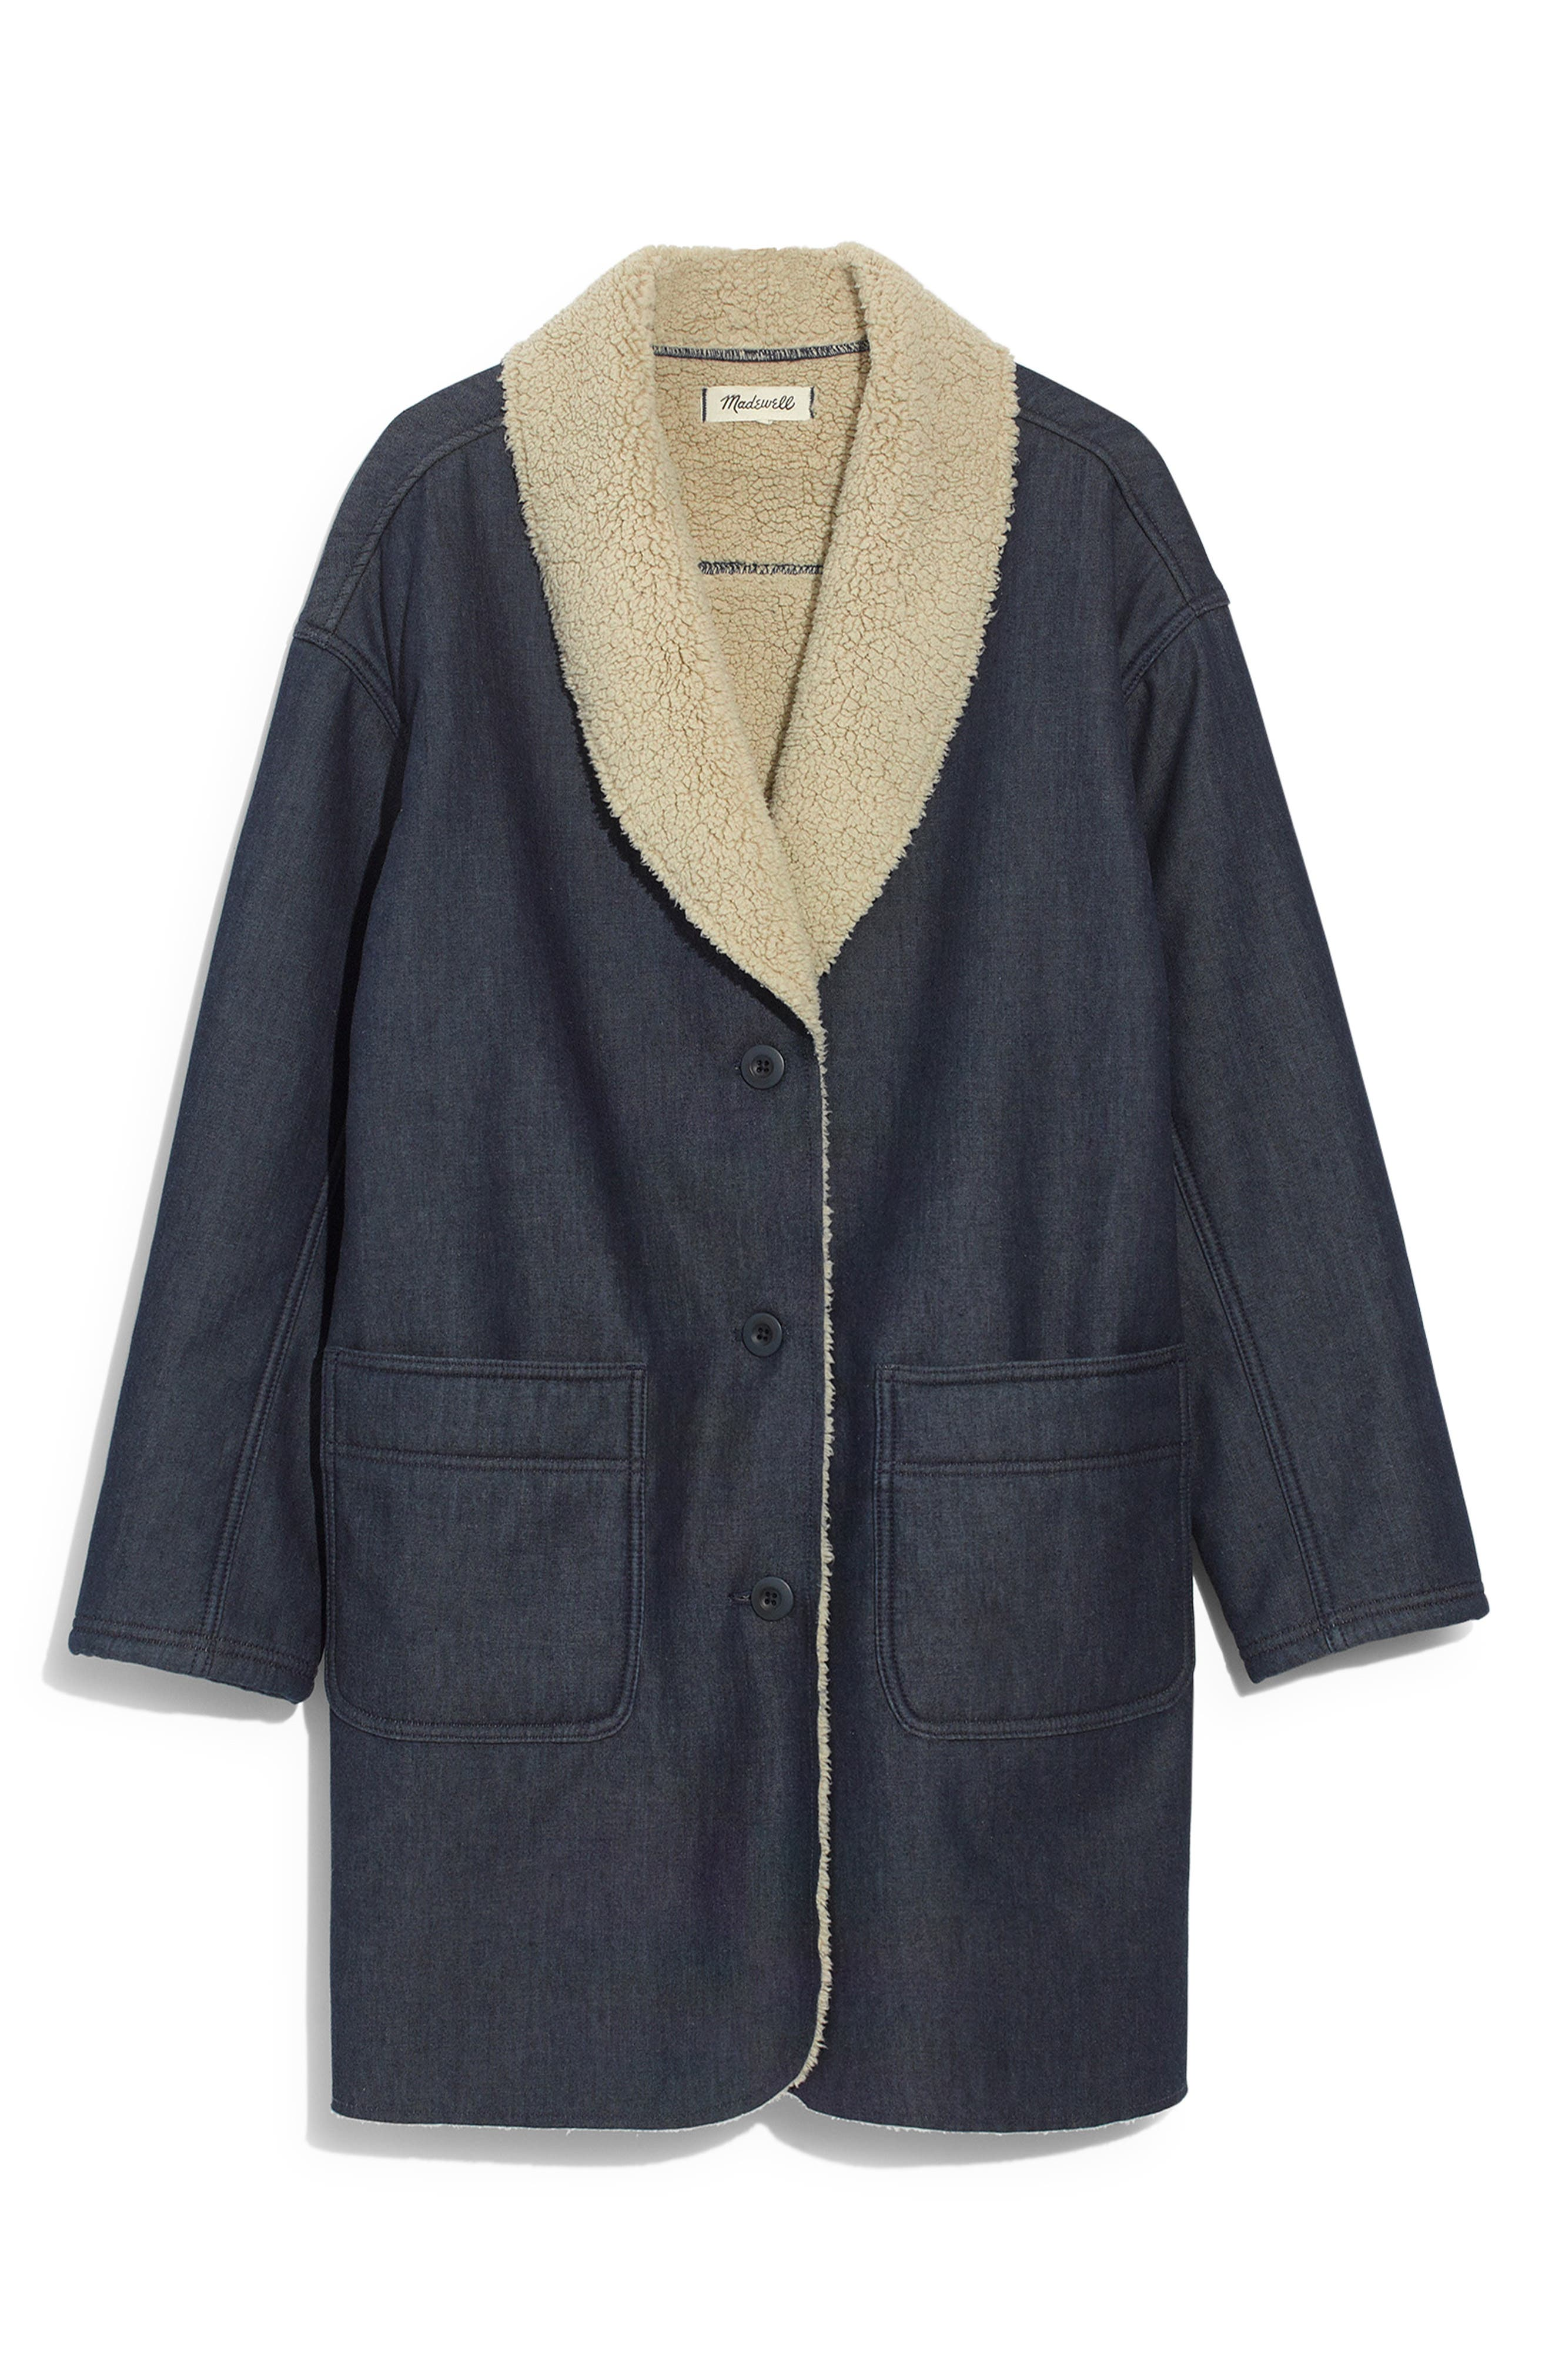 MADEWELL, Fleece Trim Denim Cocoon Coat, Alternate thumbnail 6, color, BRUNSWICK WASH